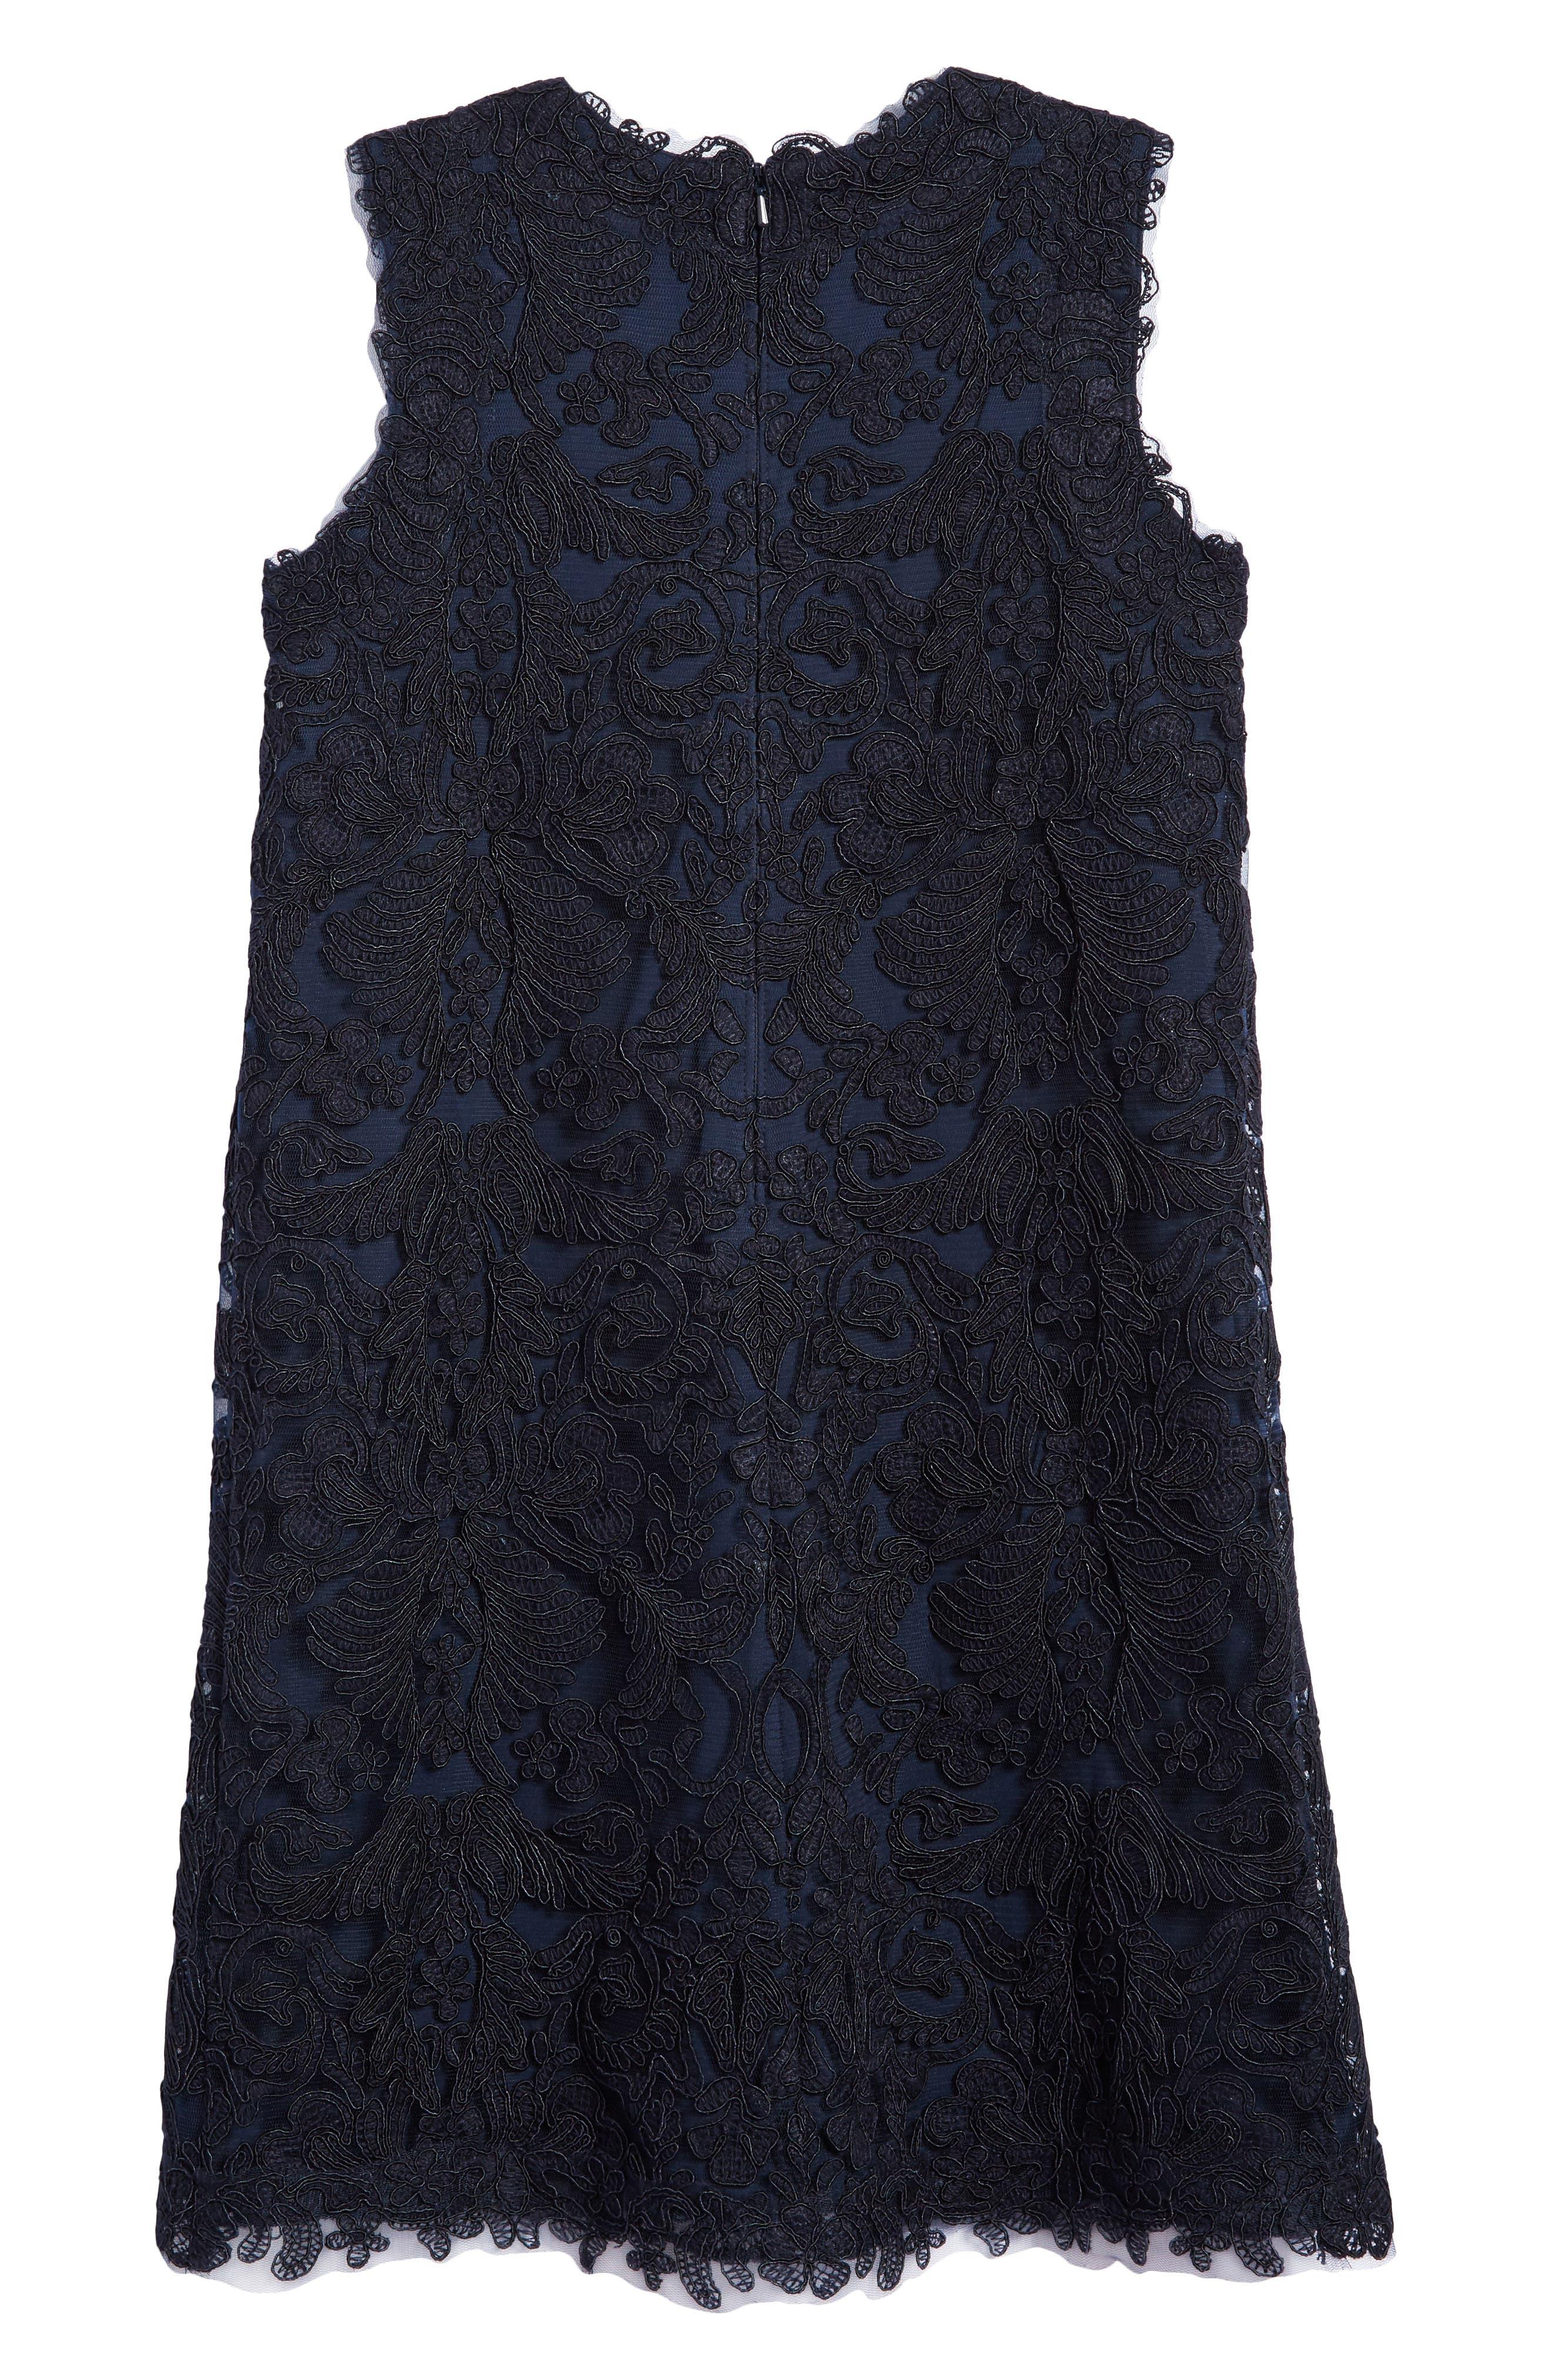 'Honeysuckle' Embroidered Tulle Dress,                             Alternate thumbnail 2, color,                             415